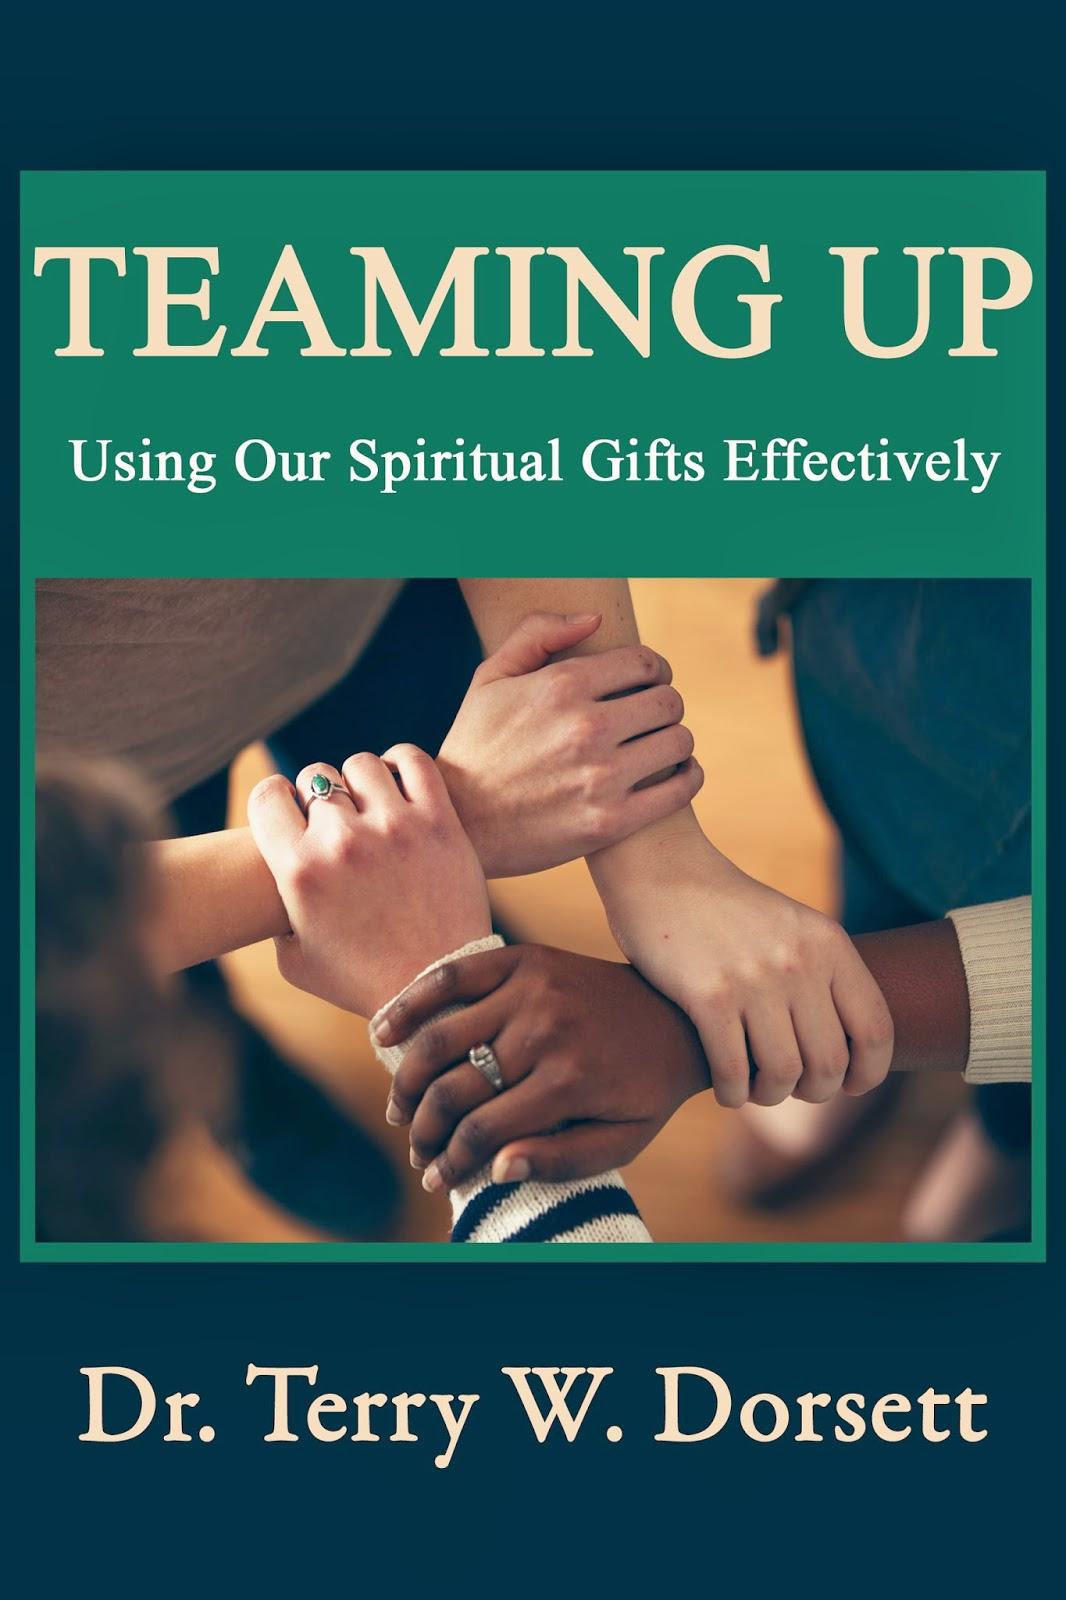 Workbooks spiritual gifts workbook : Next Generation Evangelistic Network: Using Our Spiritual Gifts ...